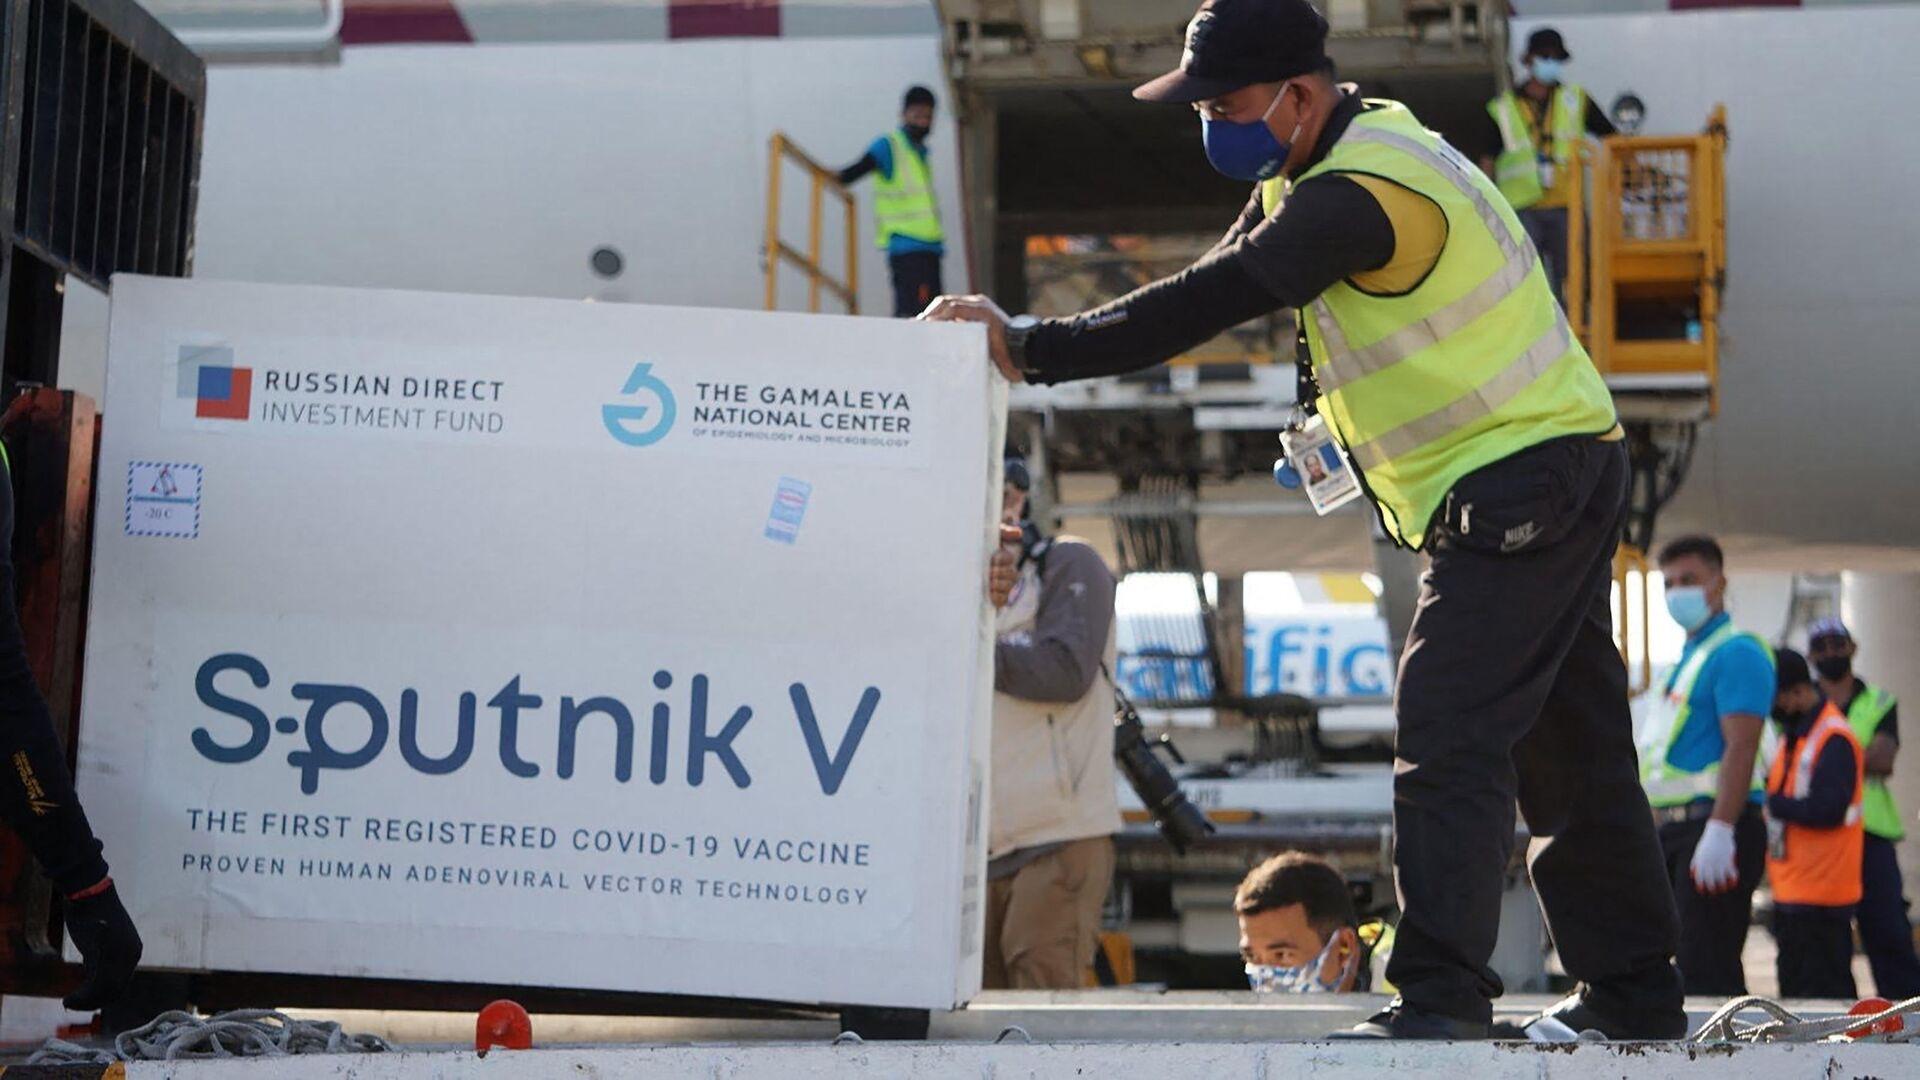 Consegna del vaccino Sputnik V alle Filippine - Sputnik Italia, 1920, 13.07.2021